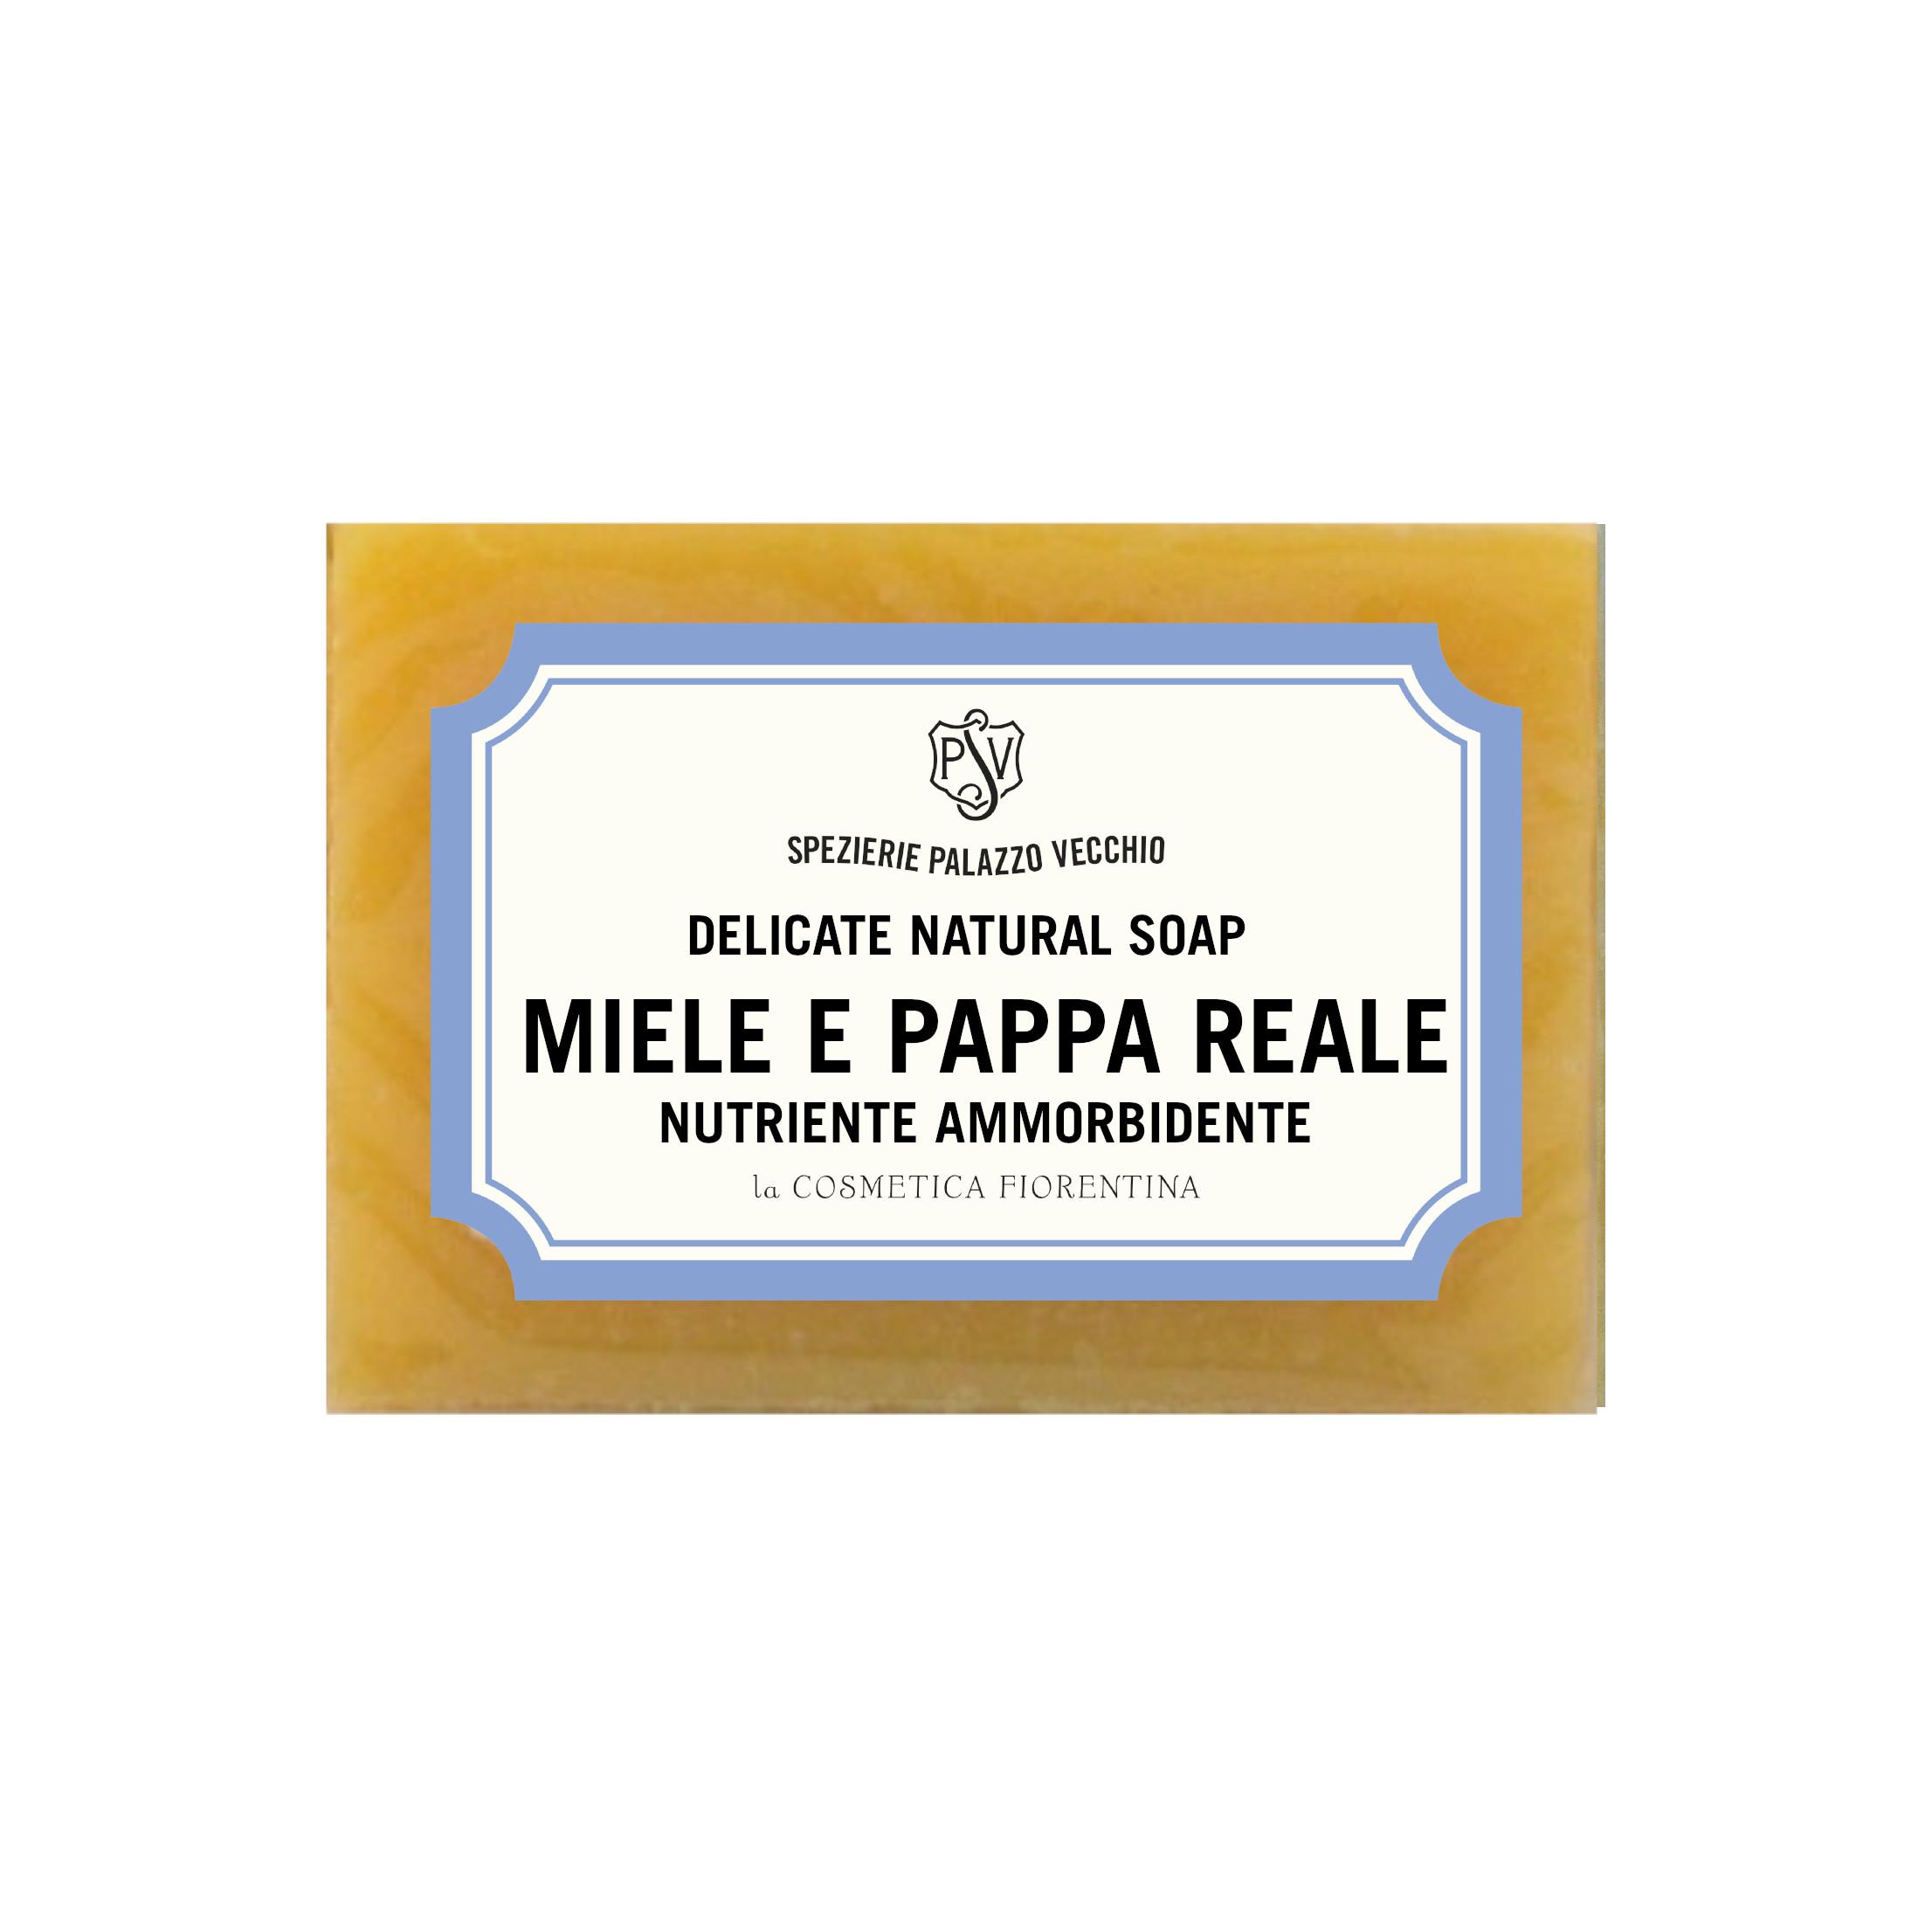 MIELE E PAPPA REALE BIOSAVON-0